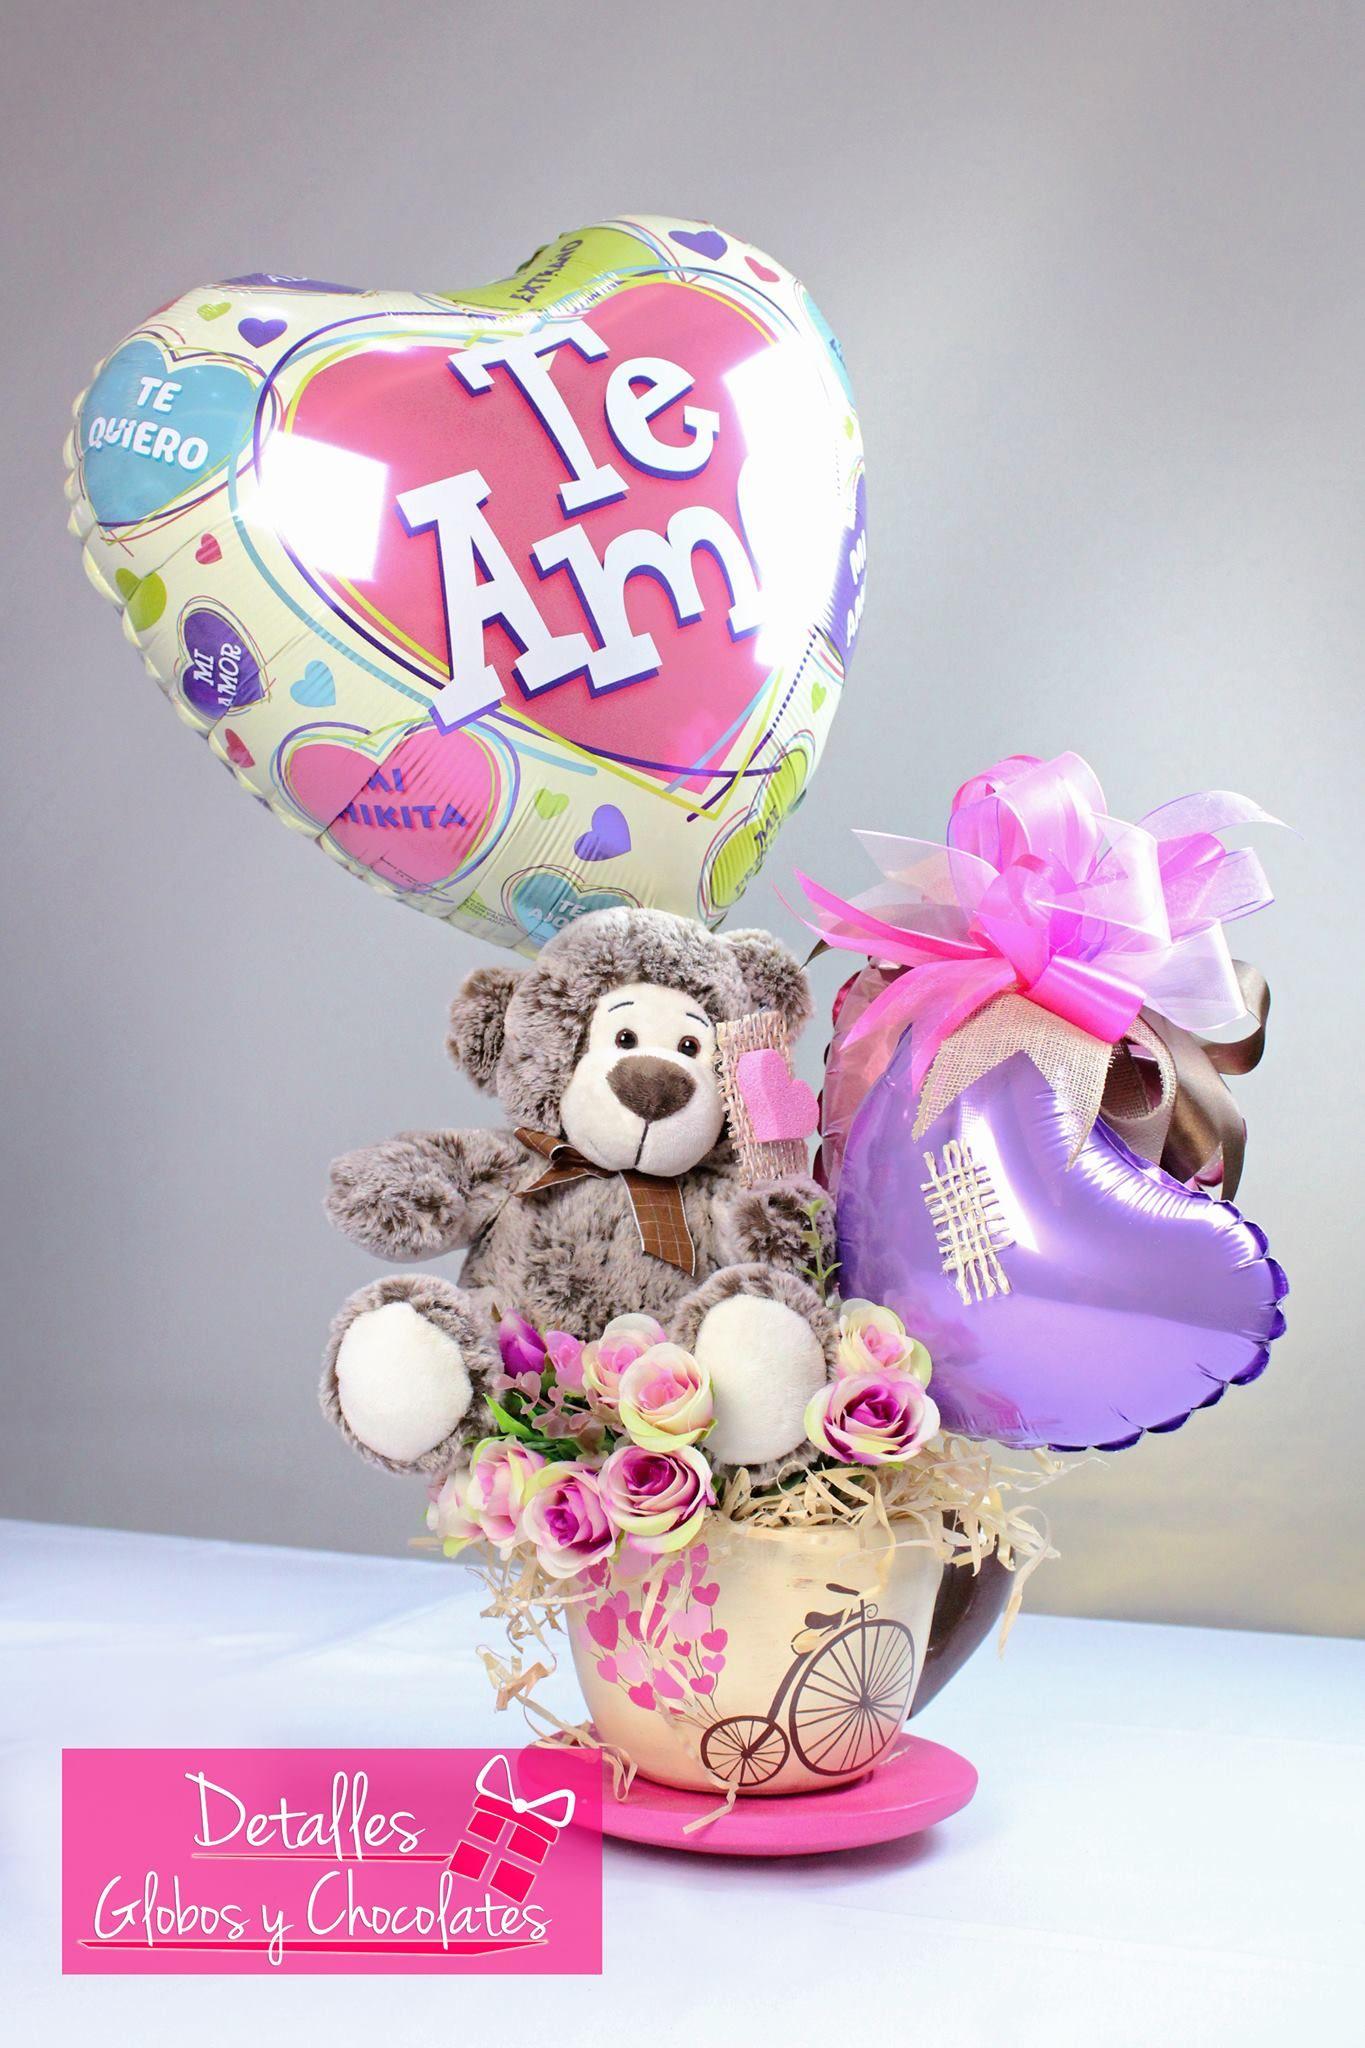 M s de 25 ideas incre bles sobre arreglos con dulces en pinterest centros de mesa dulces - Decoracion para regalos ...